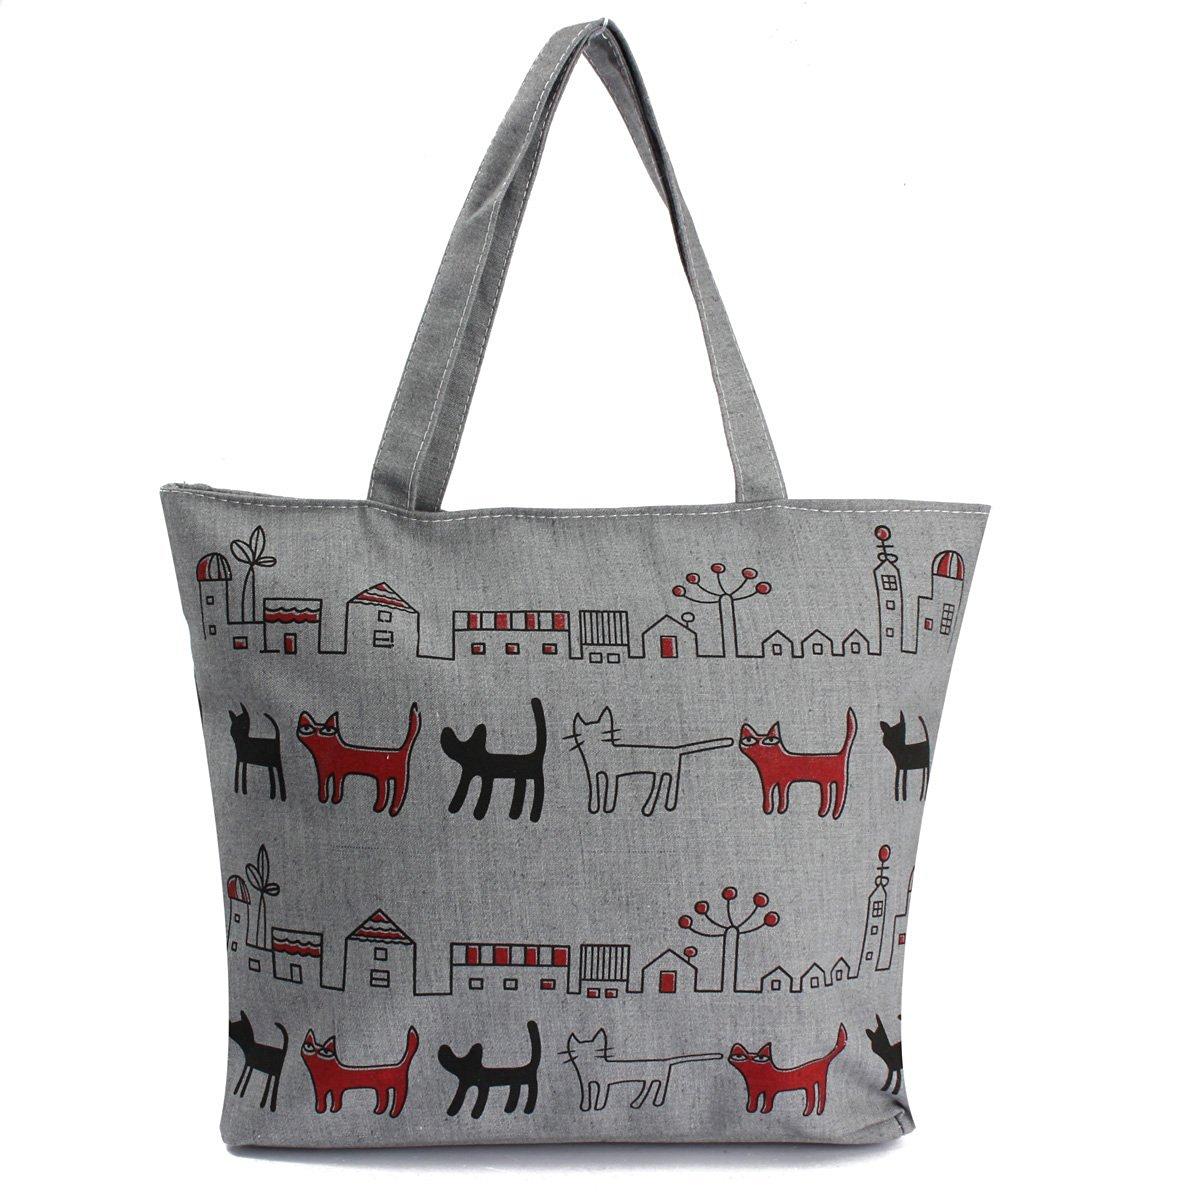 VSEN Hot Women Canvas Lady Shoulder Bag Handbag Tote Shopping Bags Zip Multi Pattern Cats fn01 multifunction canvas shoulder bag handbag backpack for women khaki